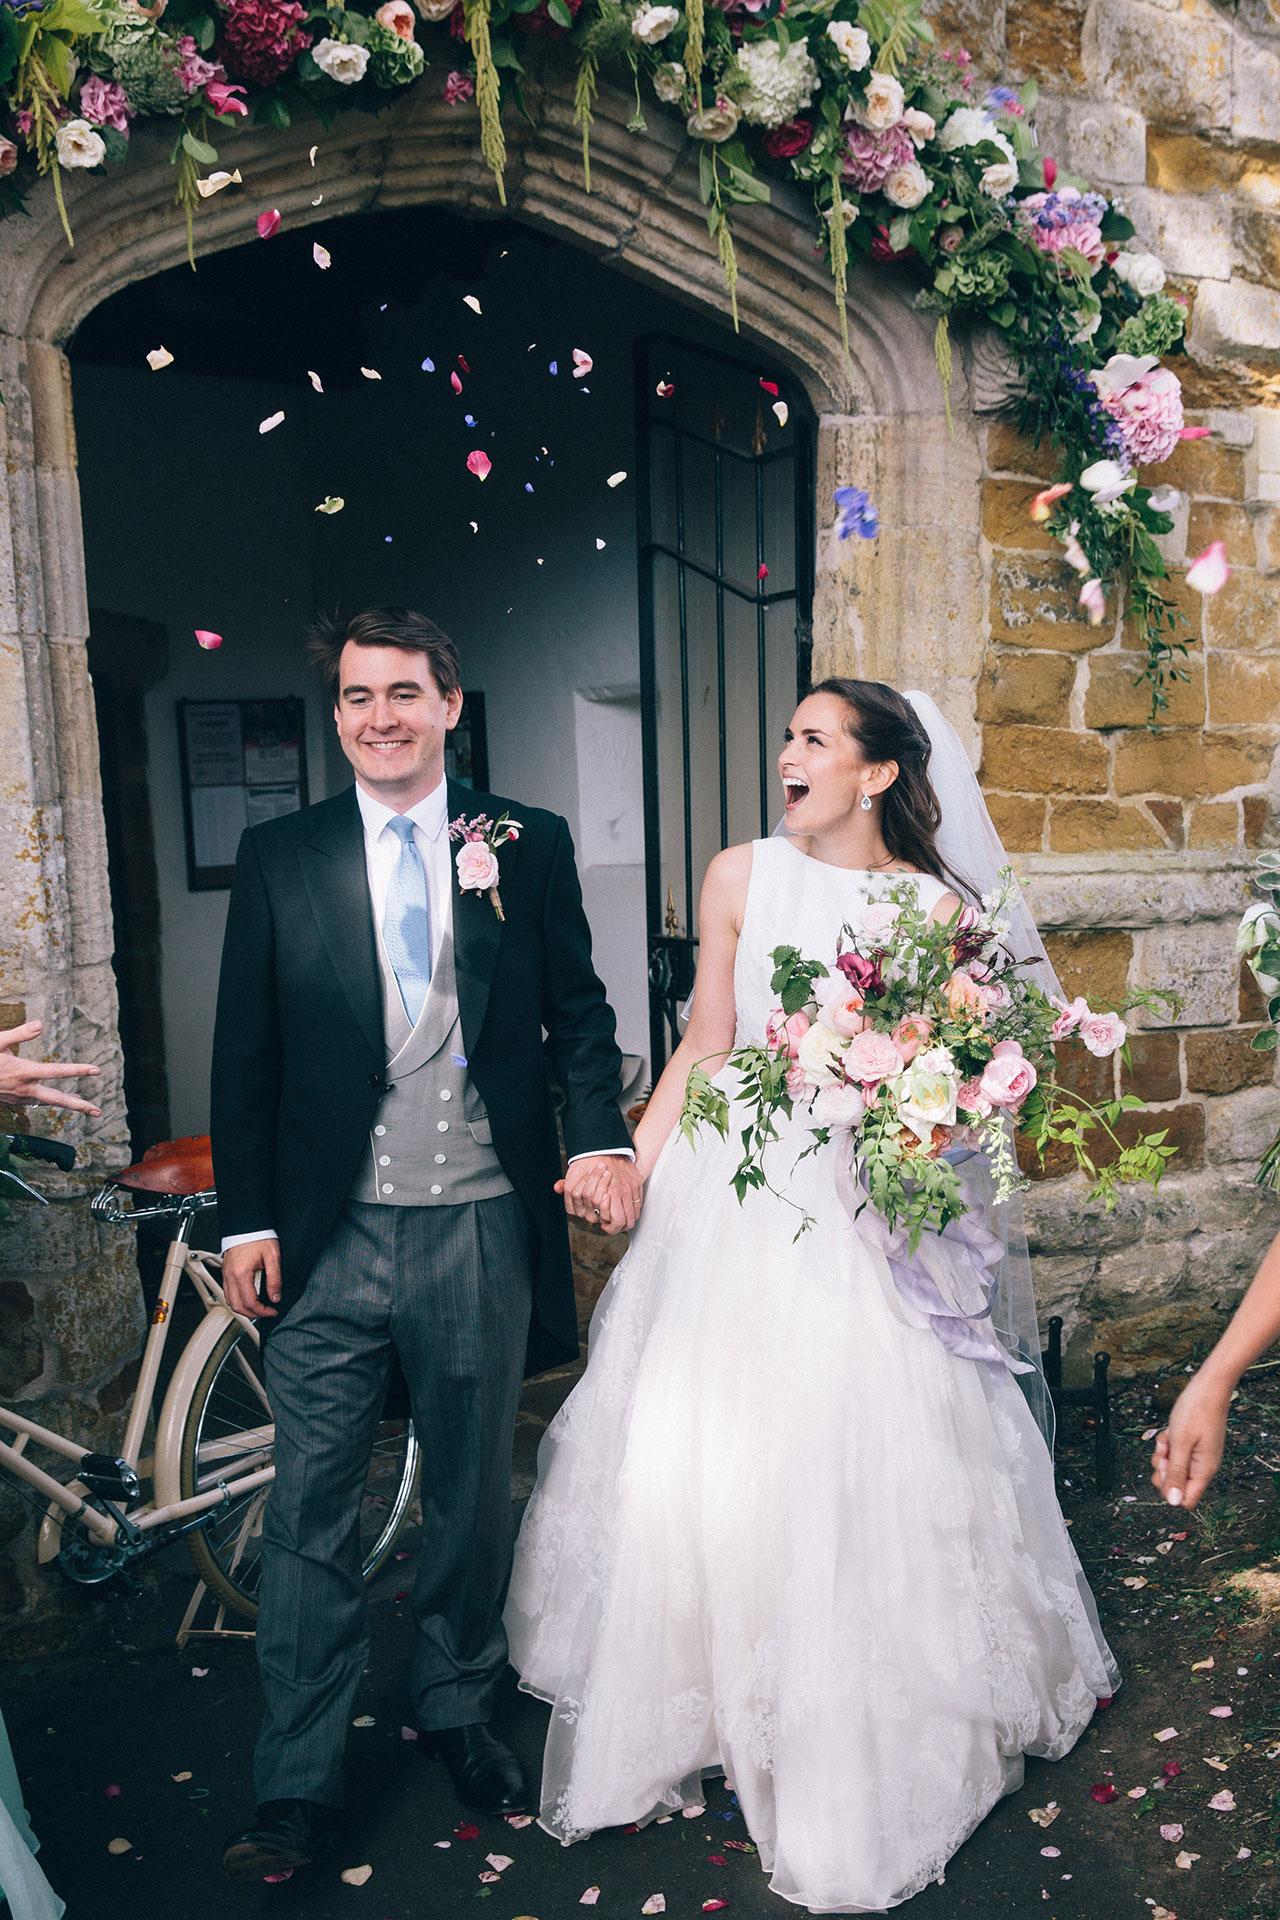 Langar-Hall-wedding-photographer-in-Nottinghamshire-Michael-Newington-Gray-46.jpg